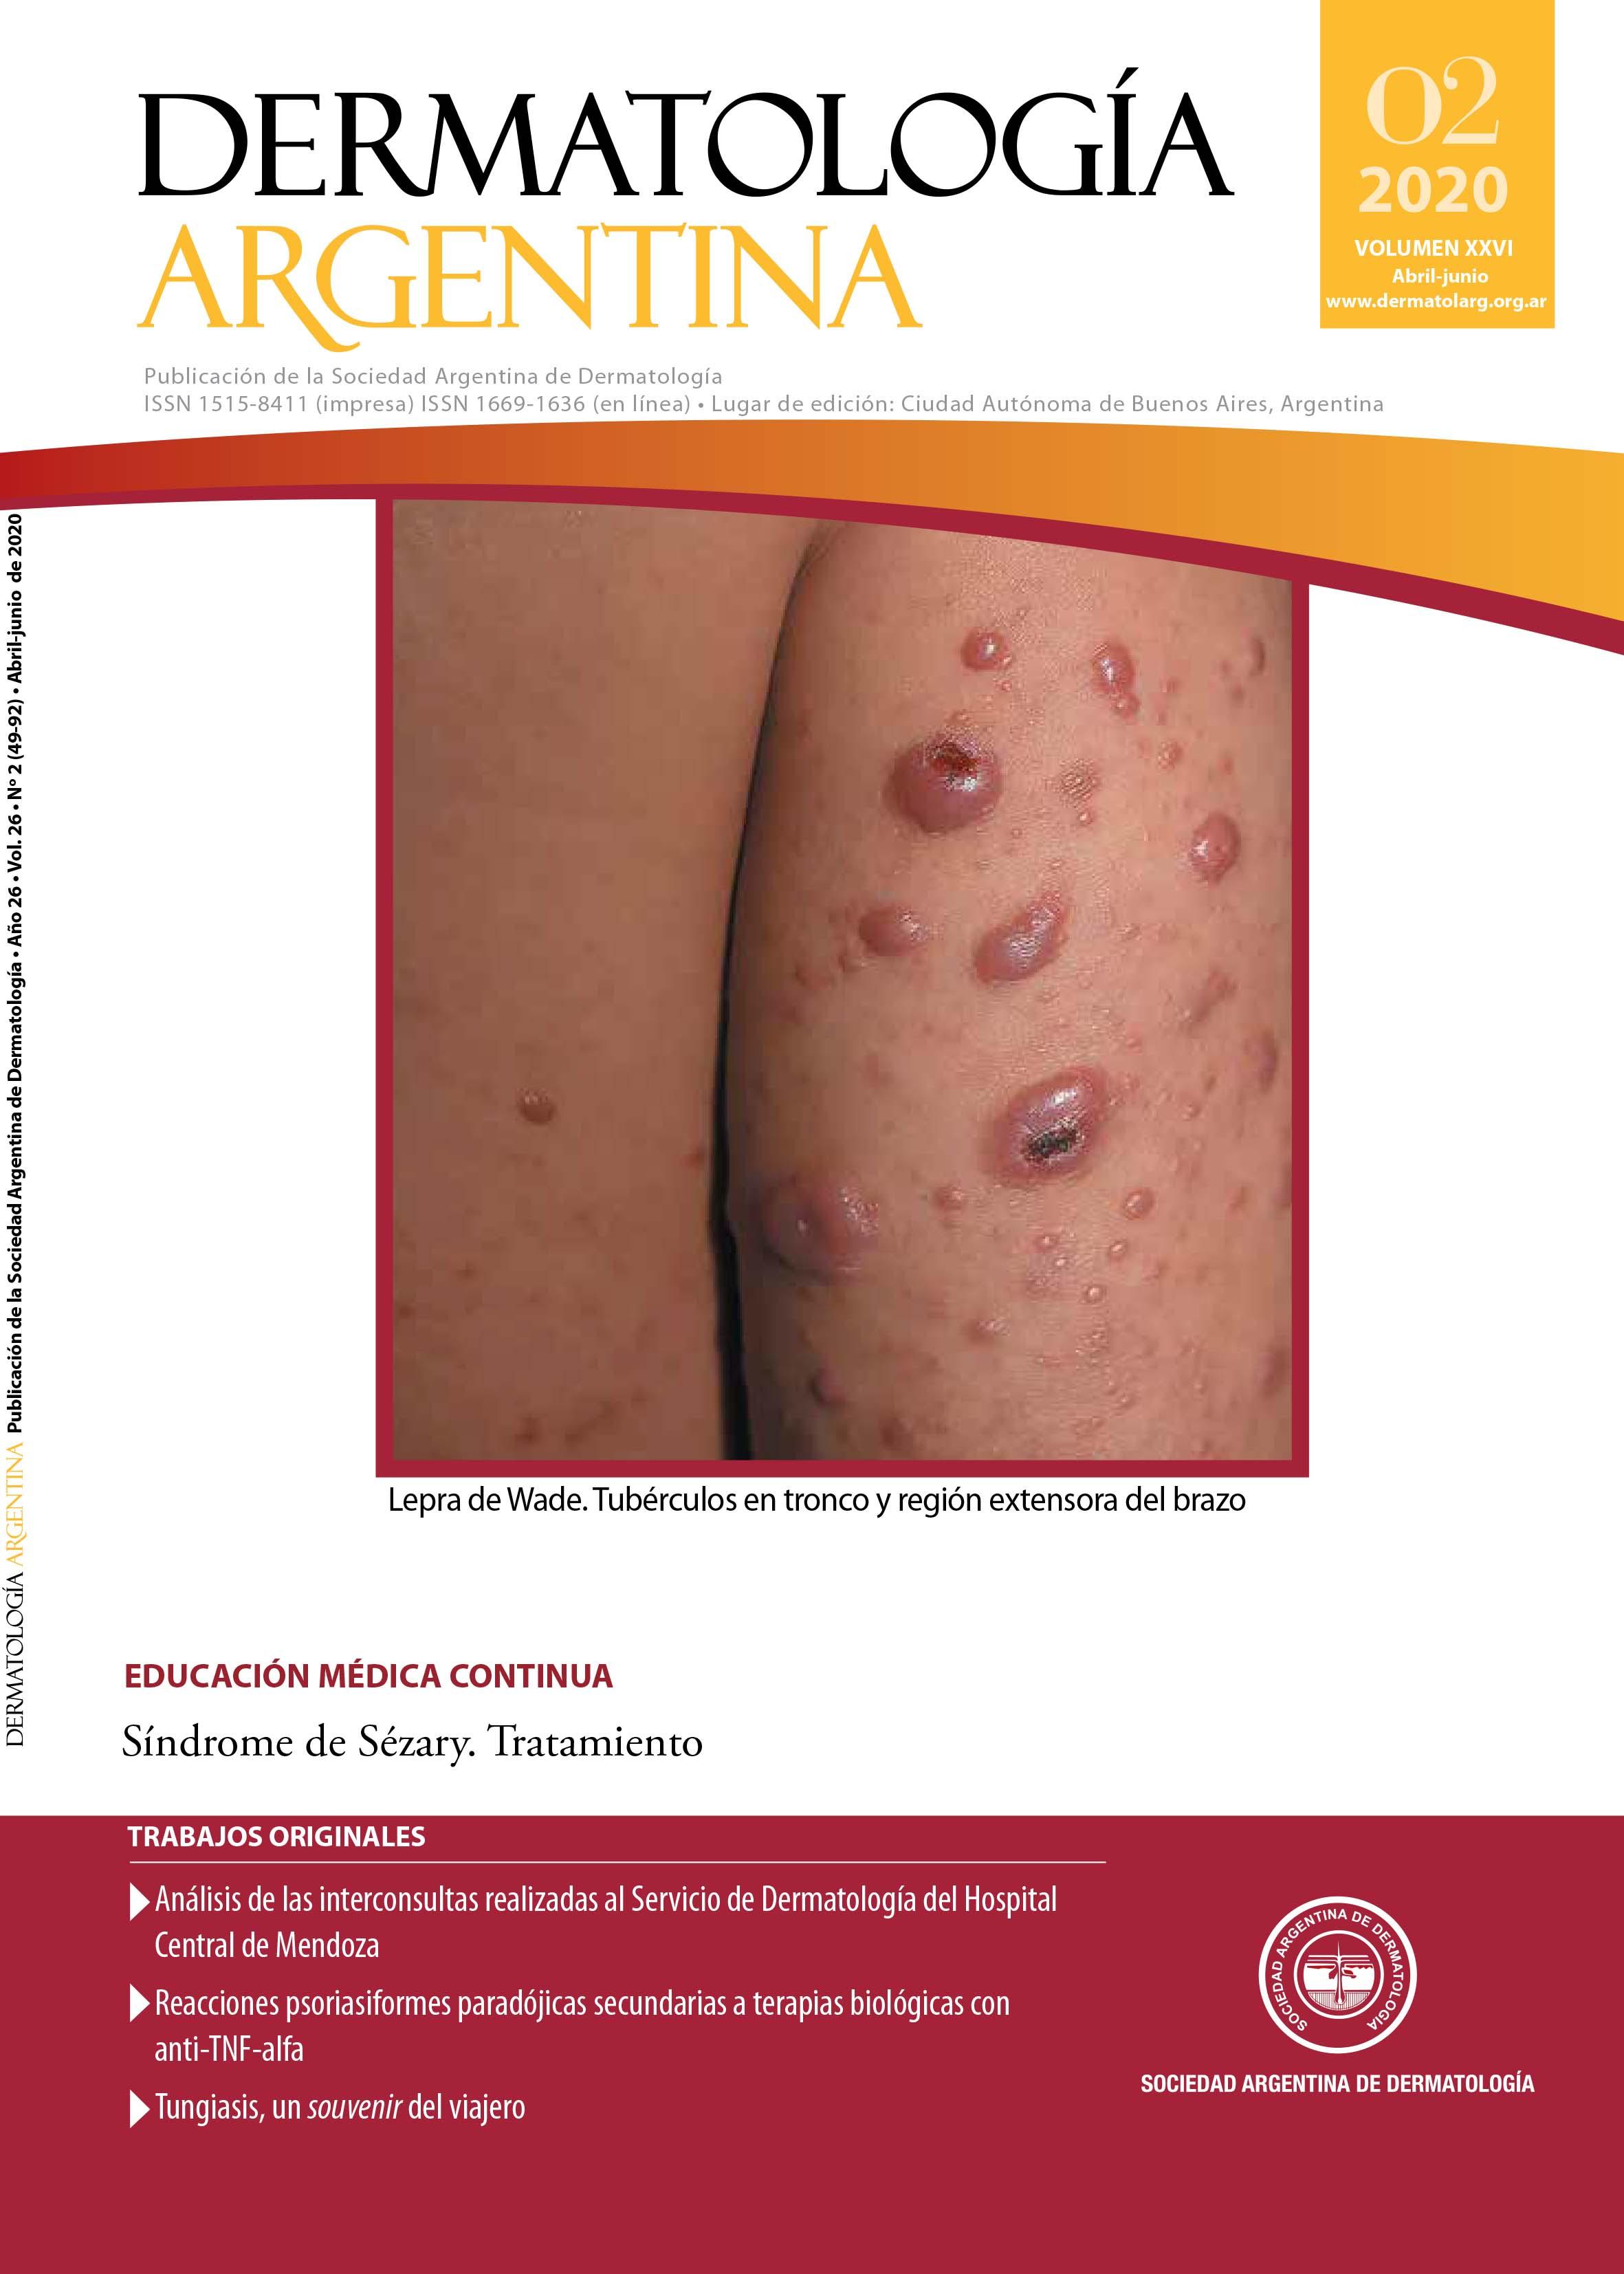 Revista Dermatología Argentina Nº 2 de 2020